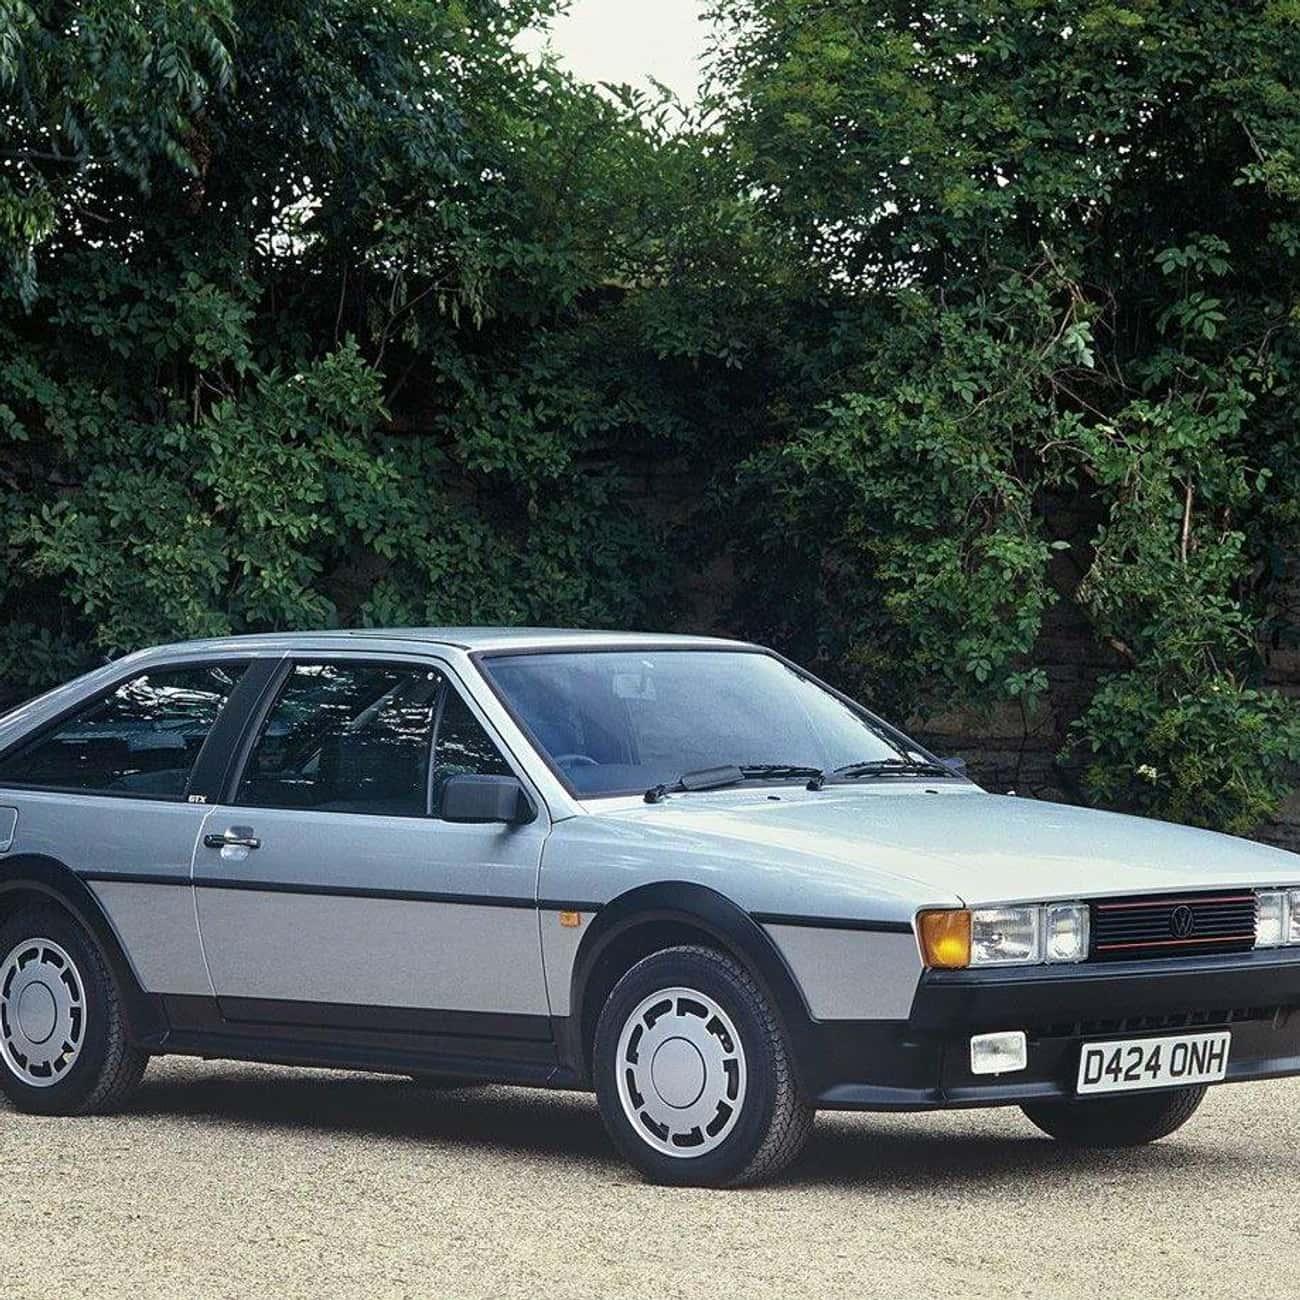 1985 Volkswagen Scirocco is listed (or ranked) 4 on the list List of Popular Volkswagen Passenger Cars Hatchbacks